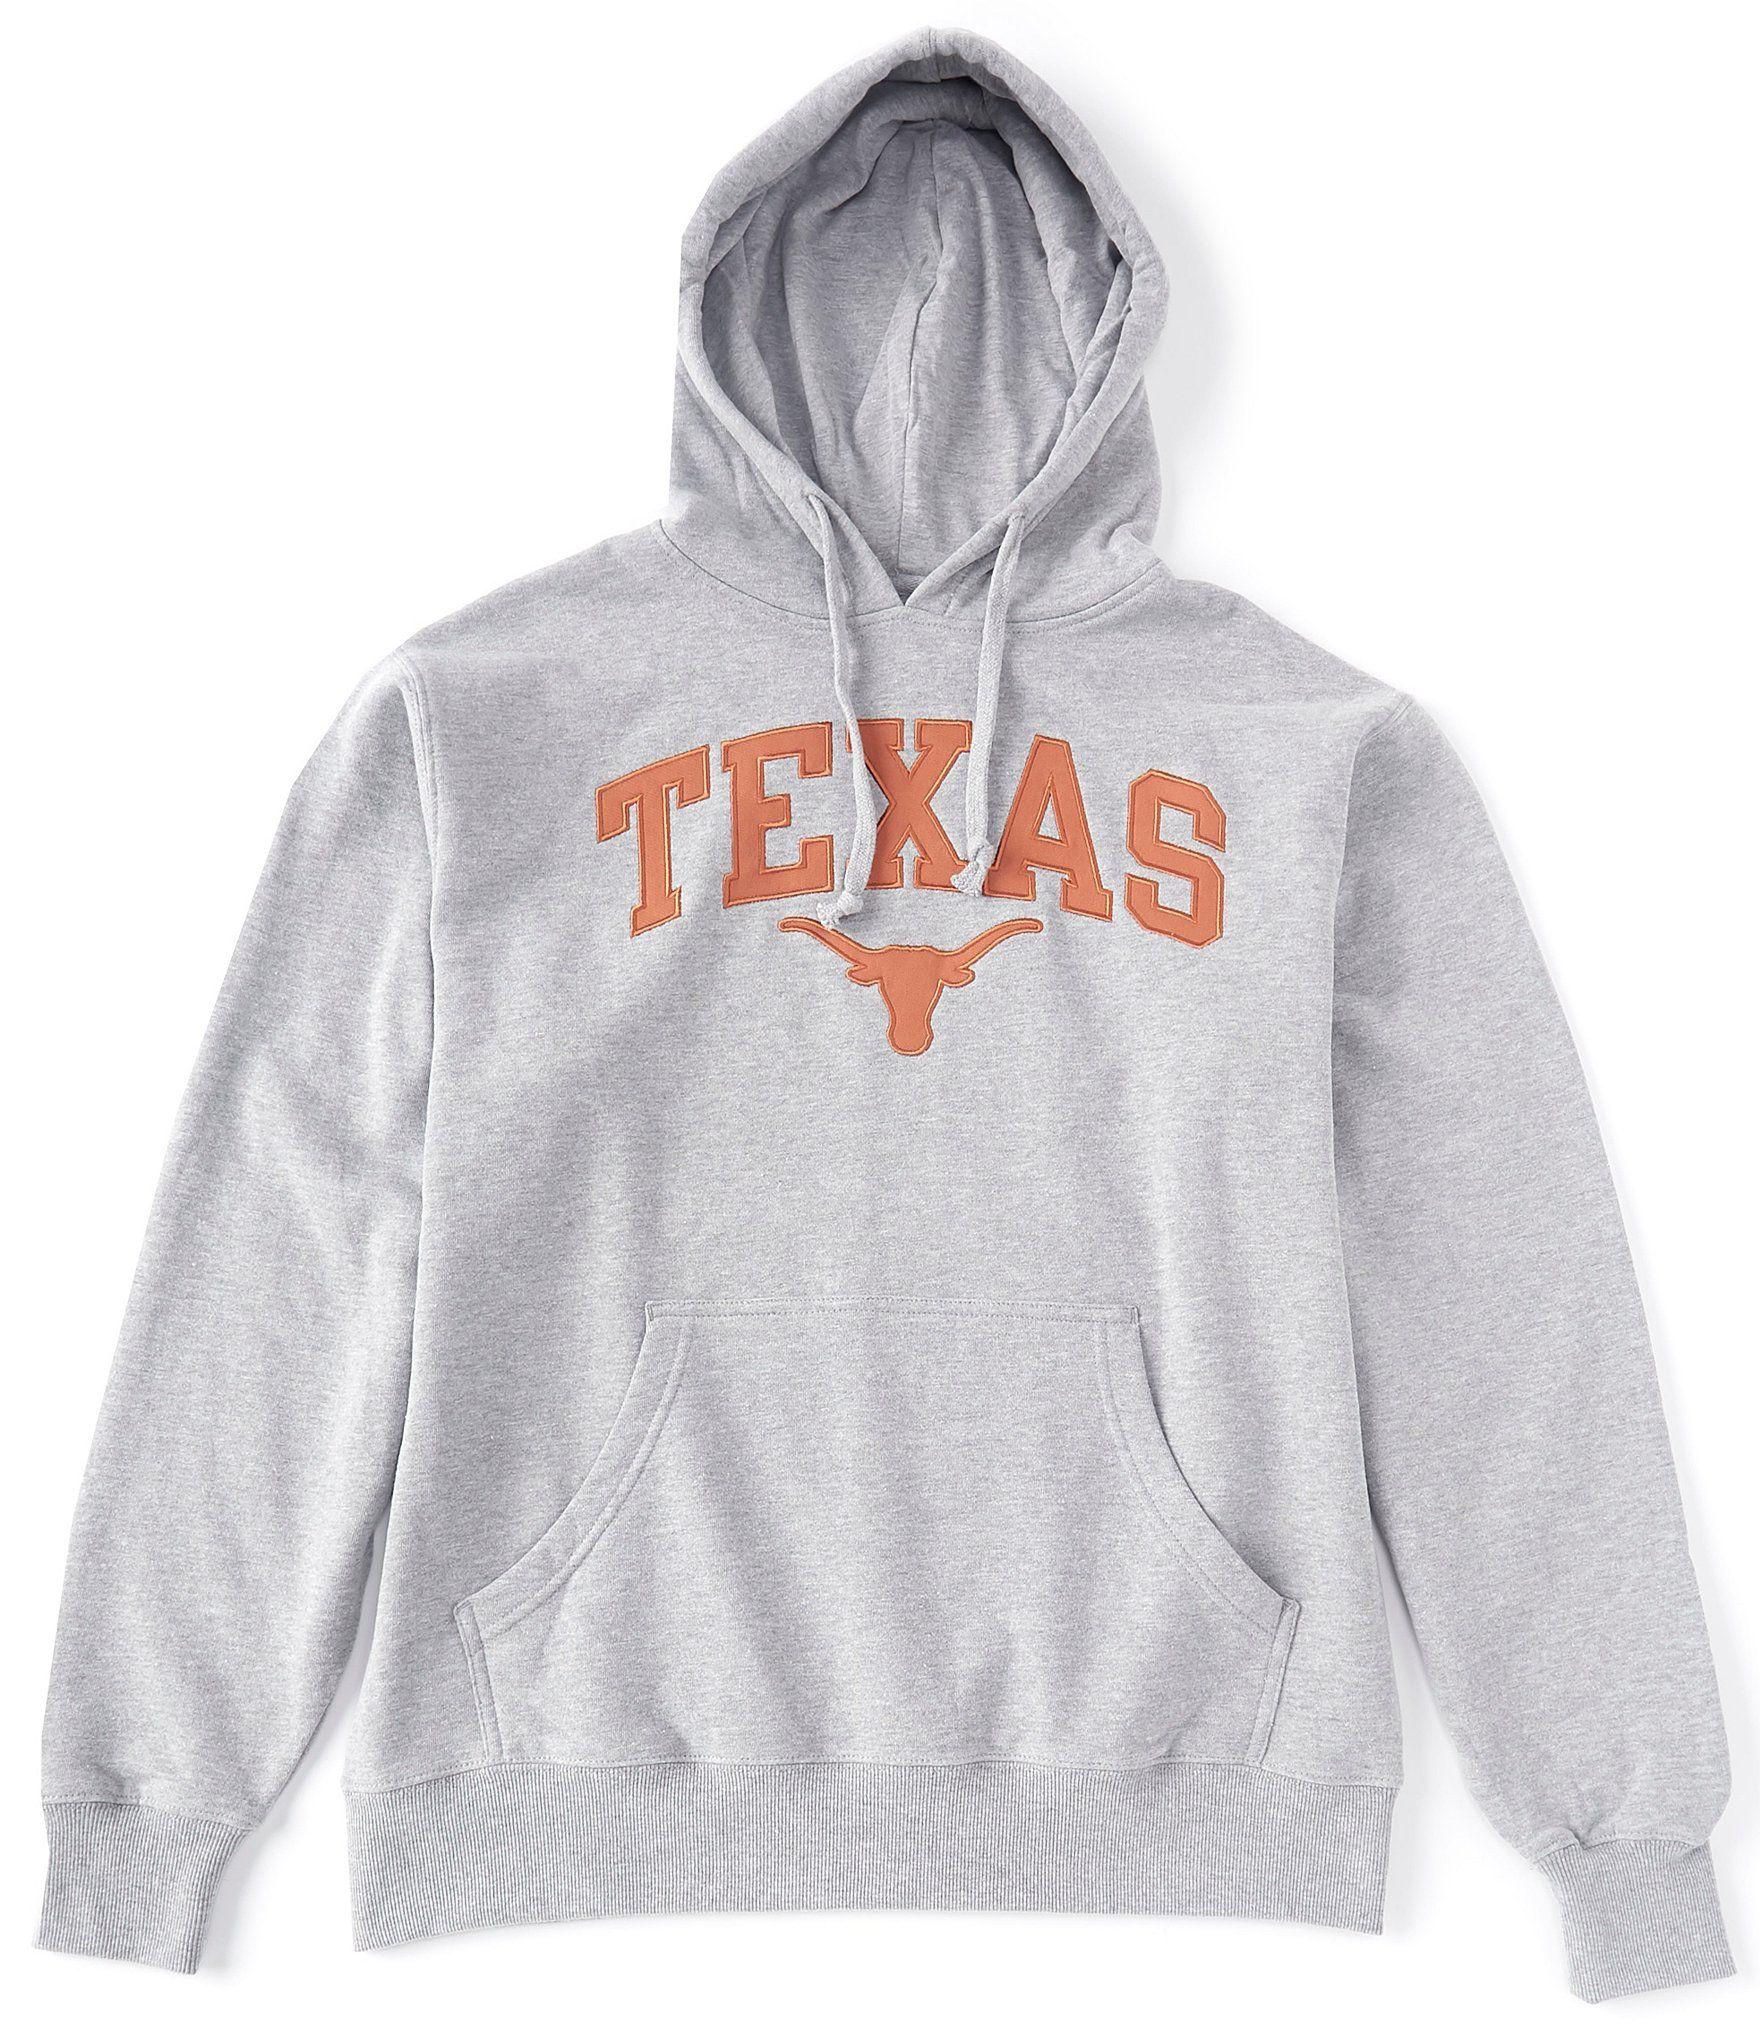 289c Apparel Texas Longhorns Arch Long Sleeve Hoodie Dillard S Long Sleeve Hoodie Hoodie 2xl Hoodies [ 2040 x 1760 Pixel ]